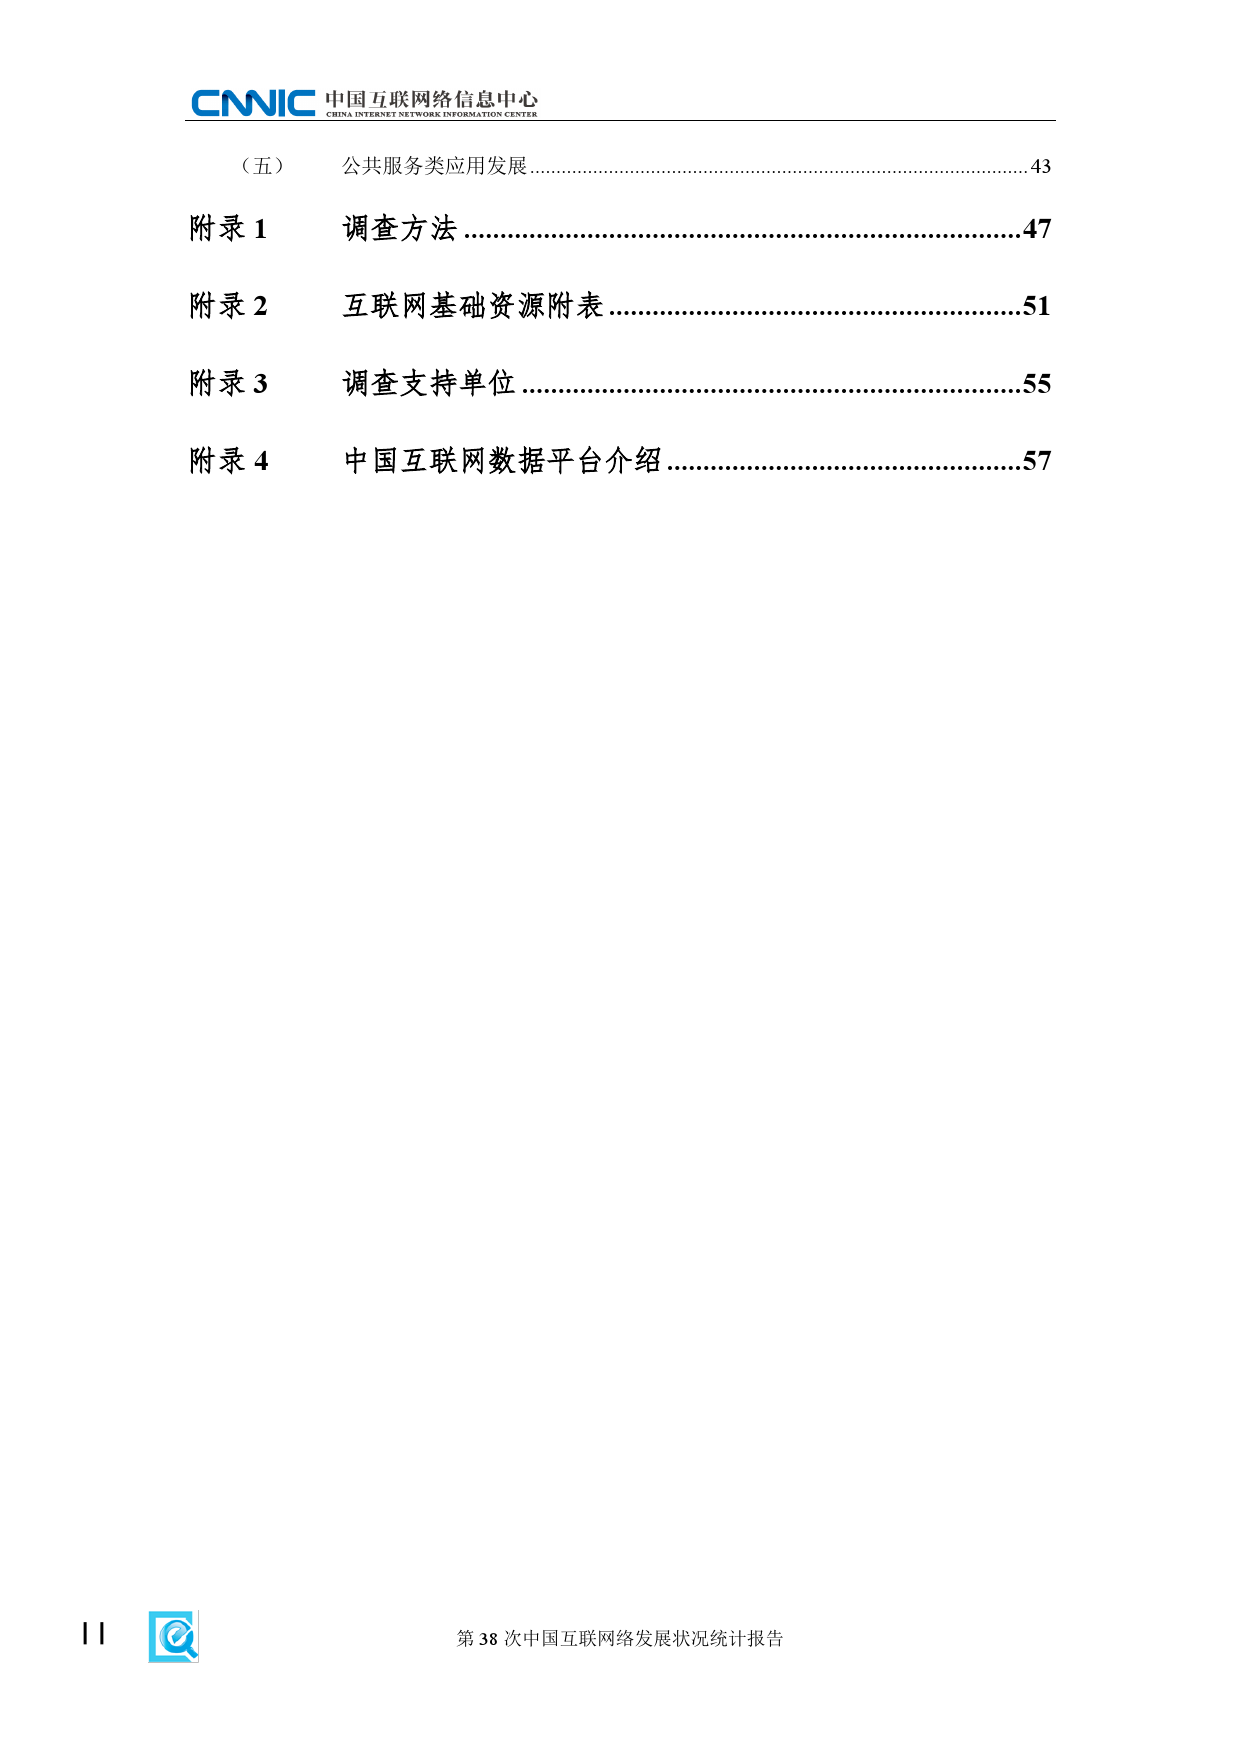 CNNIC:2015年第38次中国互联网络发展状况统计报告_000006